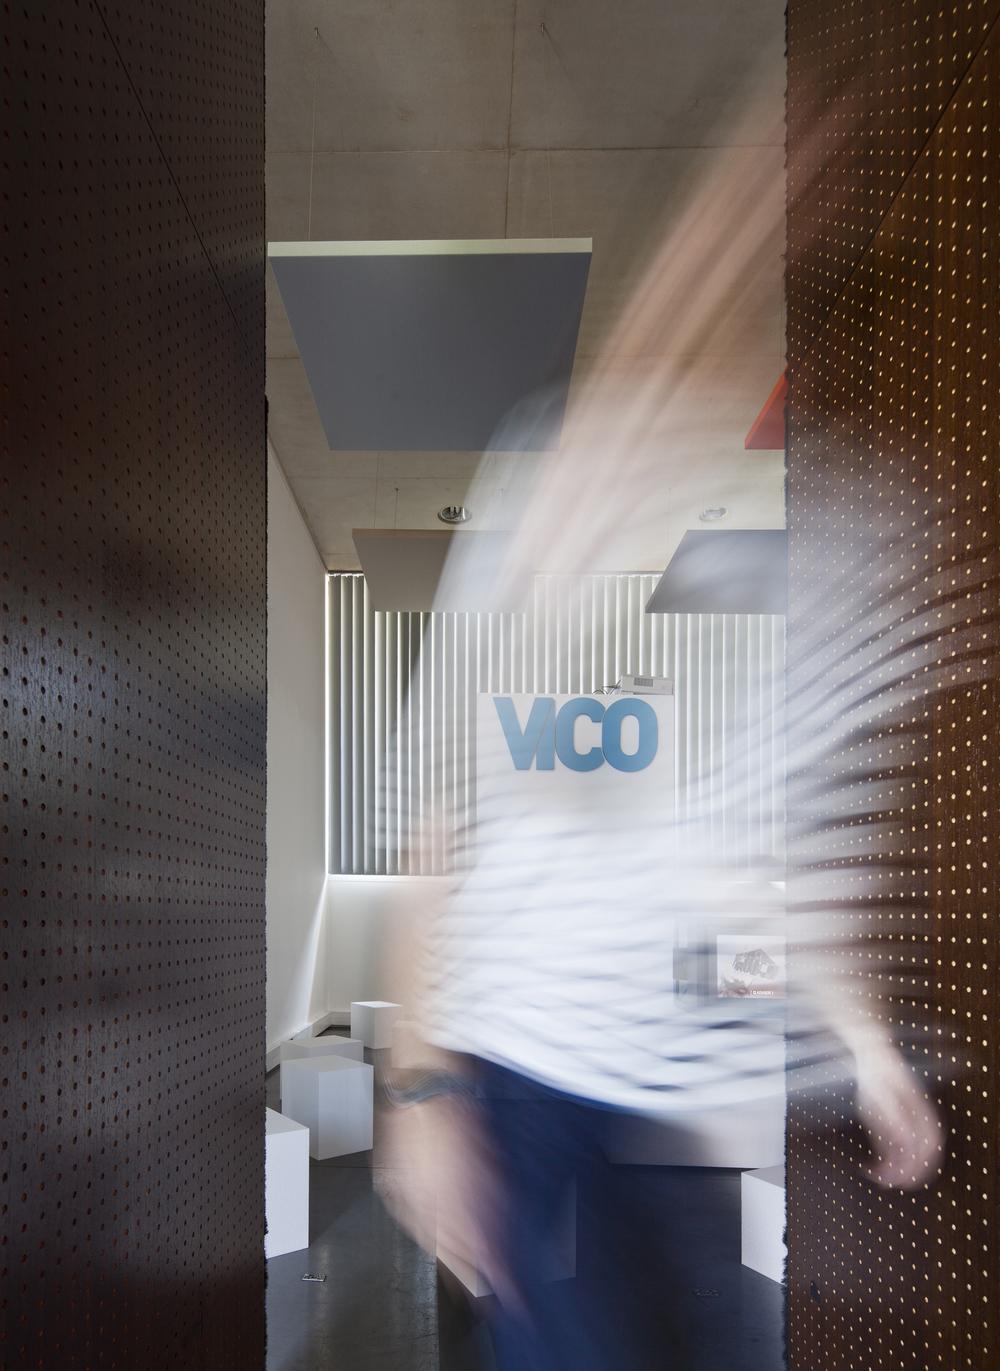 VICO_010.jpg